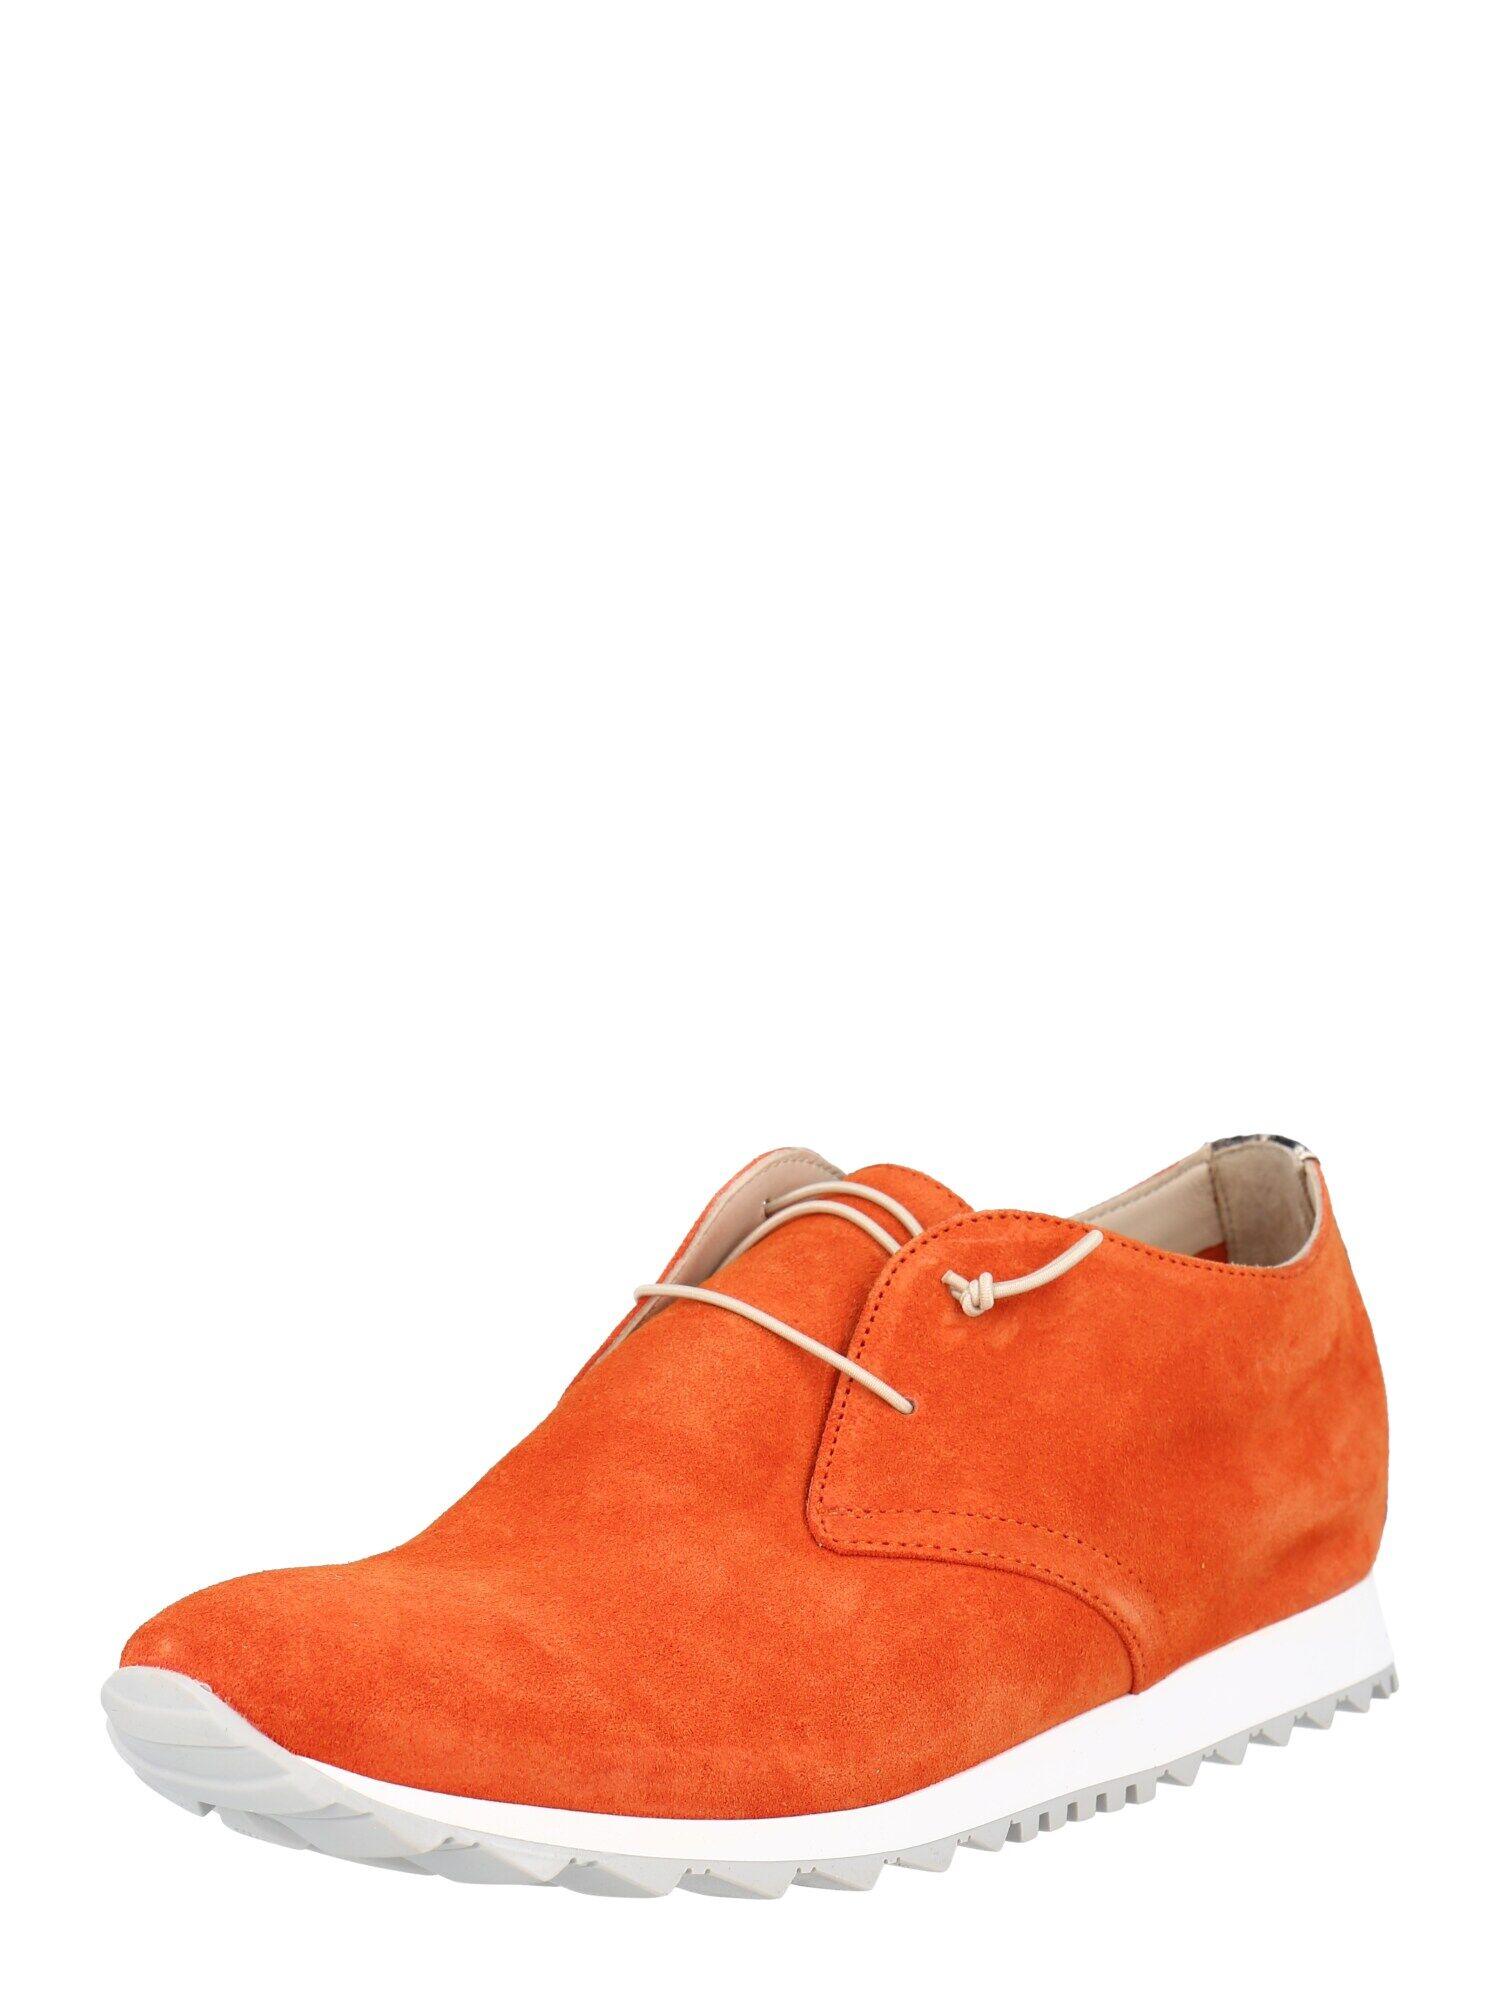 donna carolina scarpa stringata arancione